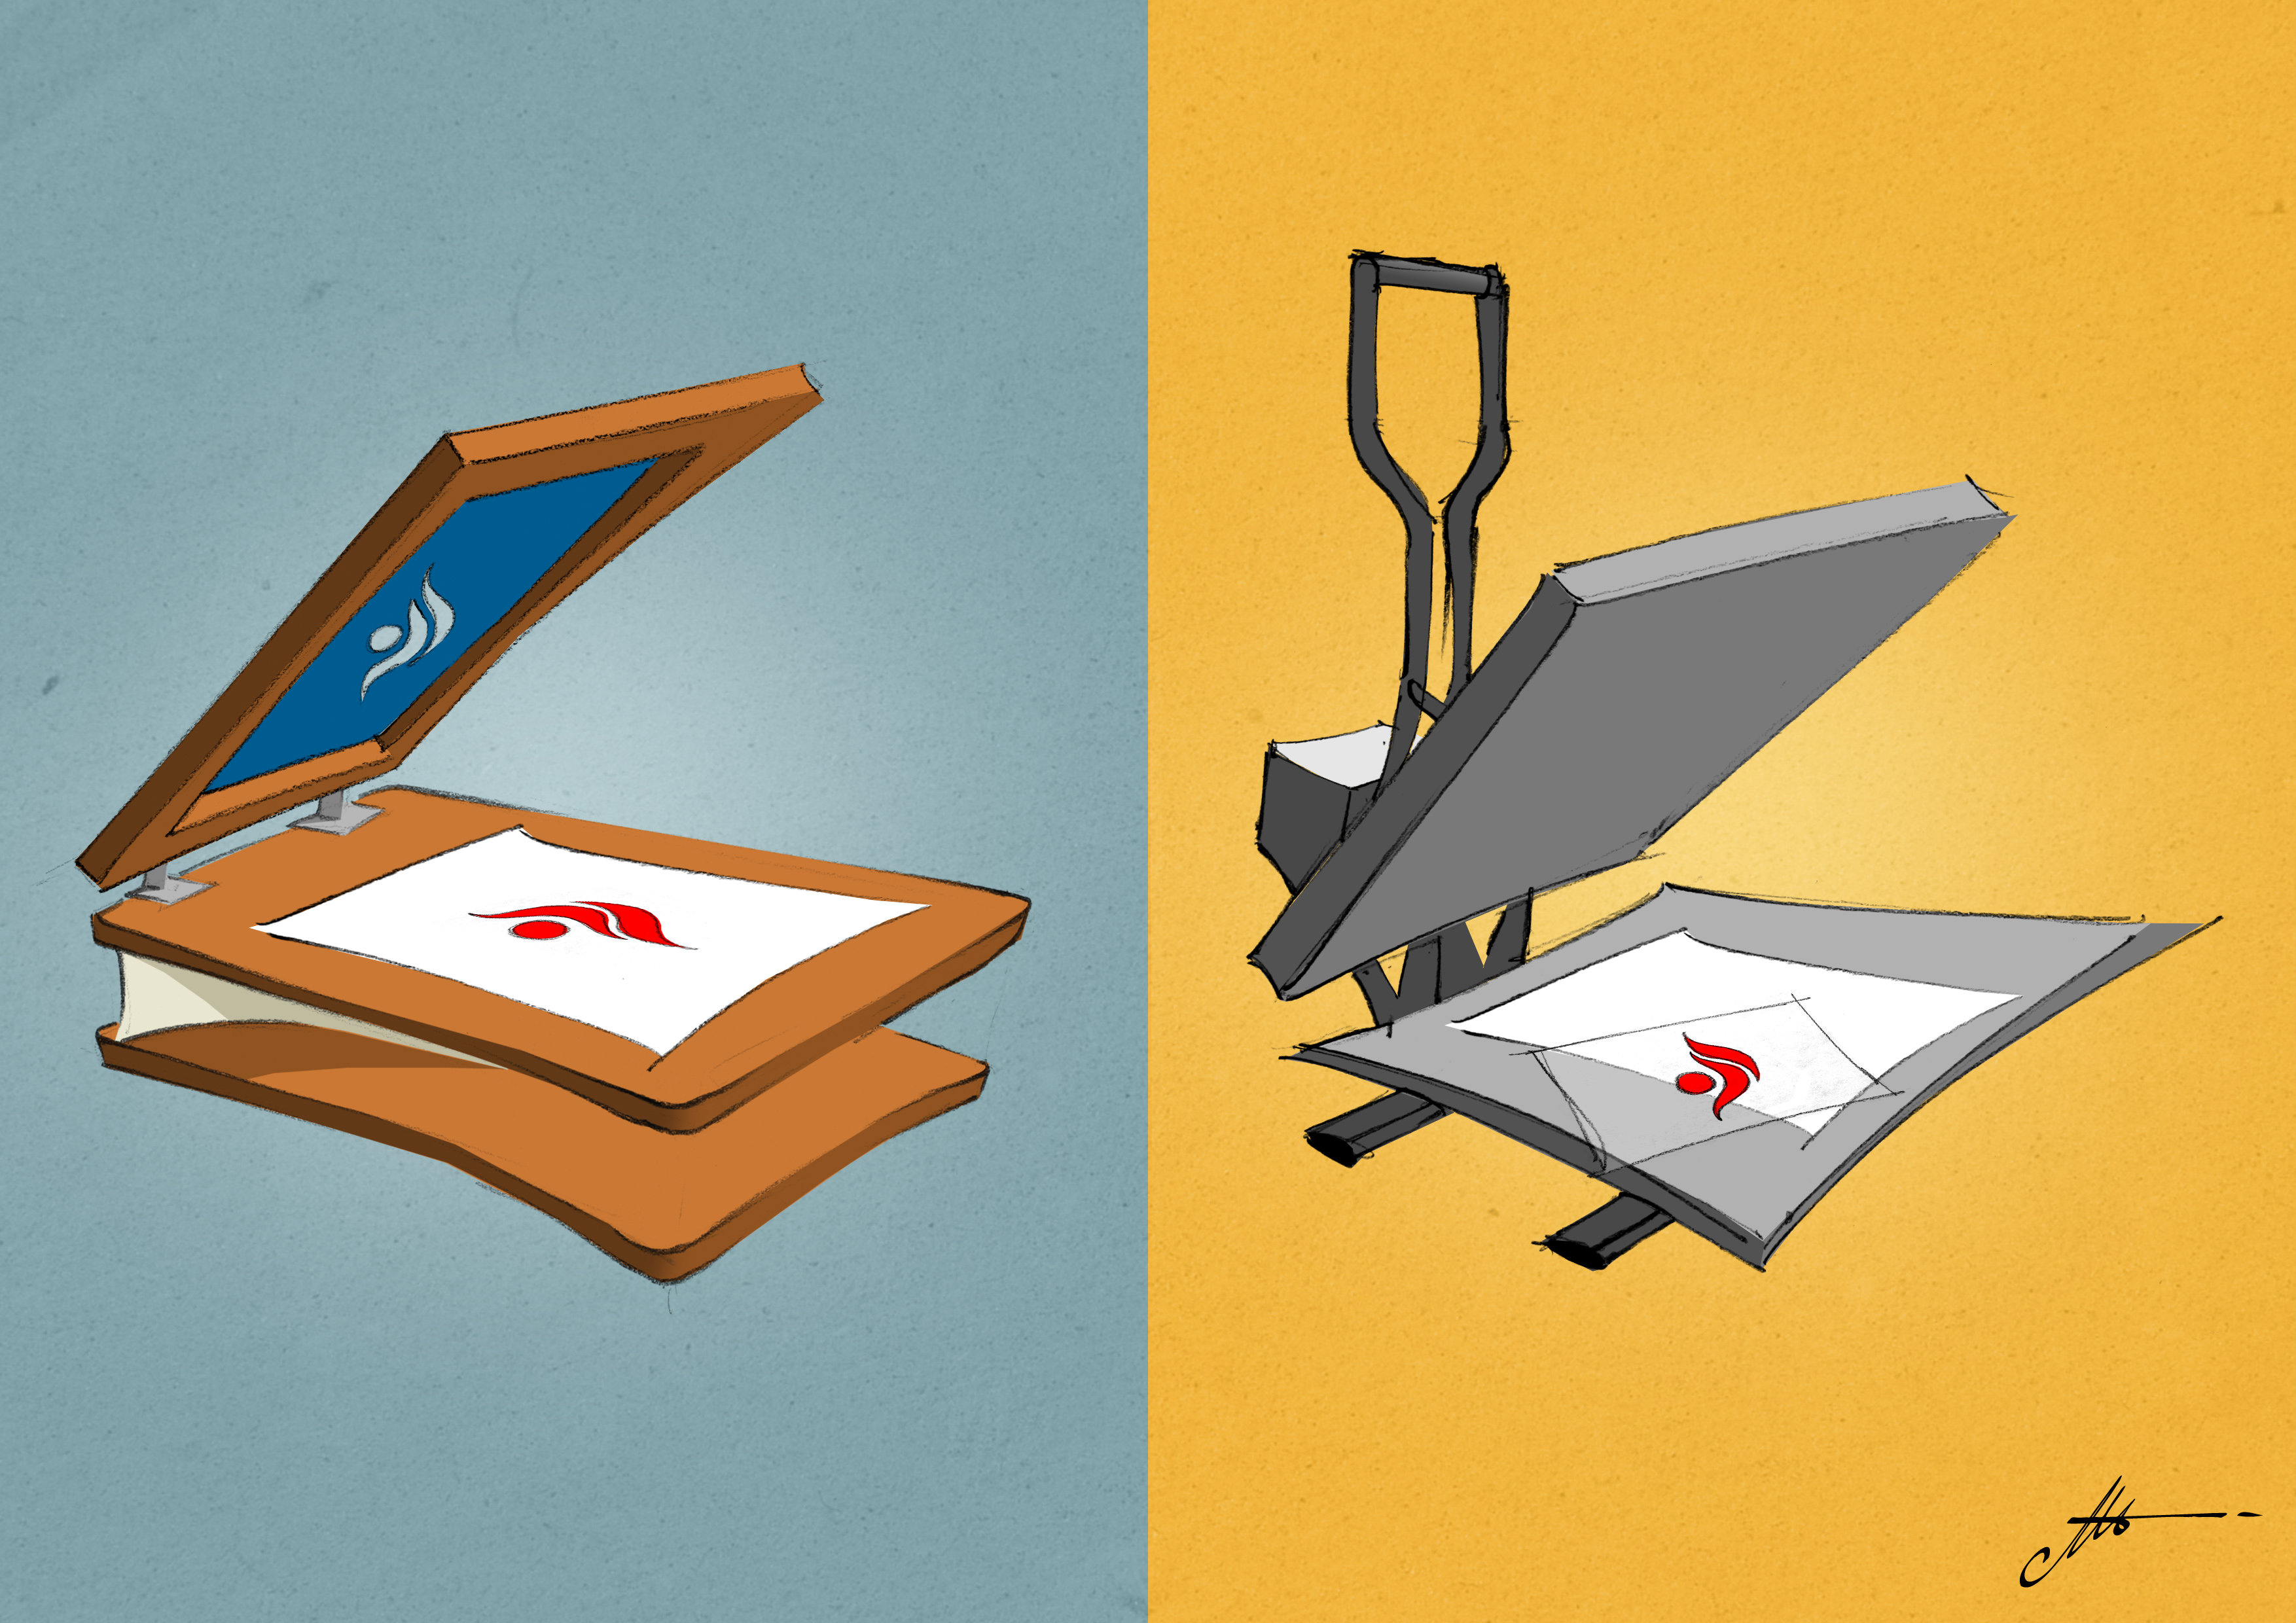 stampa serigrafia o digitale